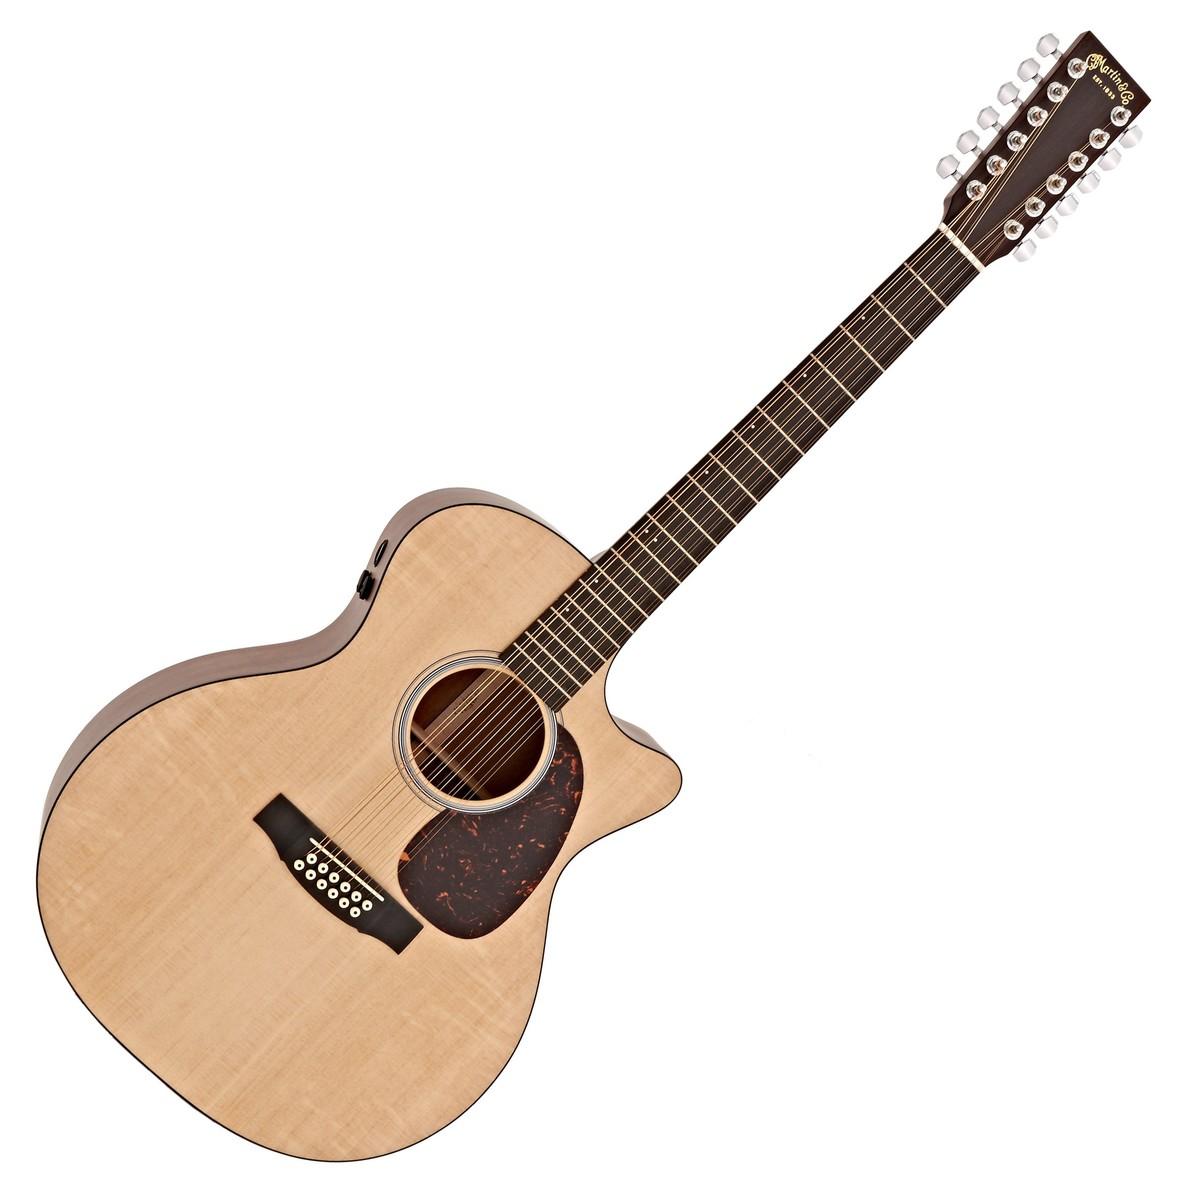 martin gpc12pa4 spectacle artiste guitare electro. Black Bedroom Furniture Sets. Home Design Ideas